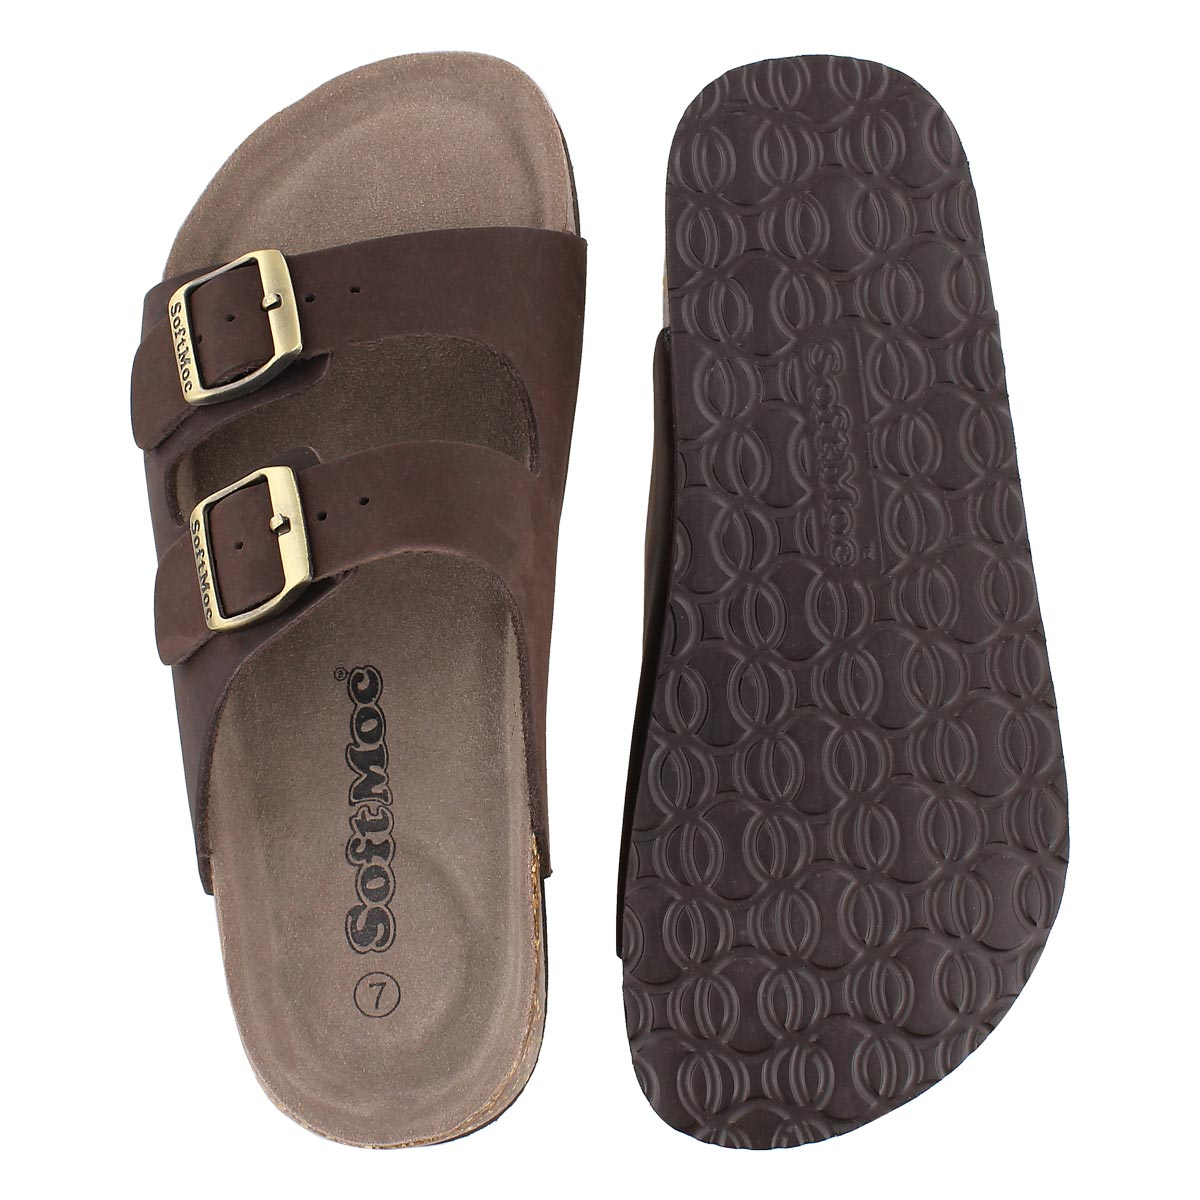 Lds Anna 3 brn crz memory footbed sandal